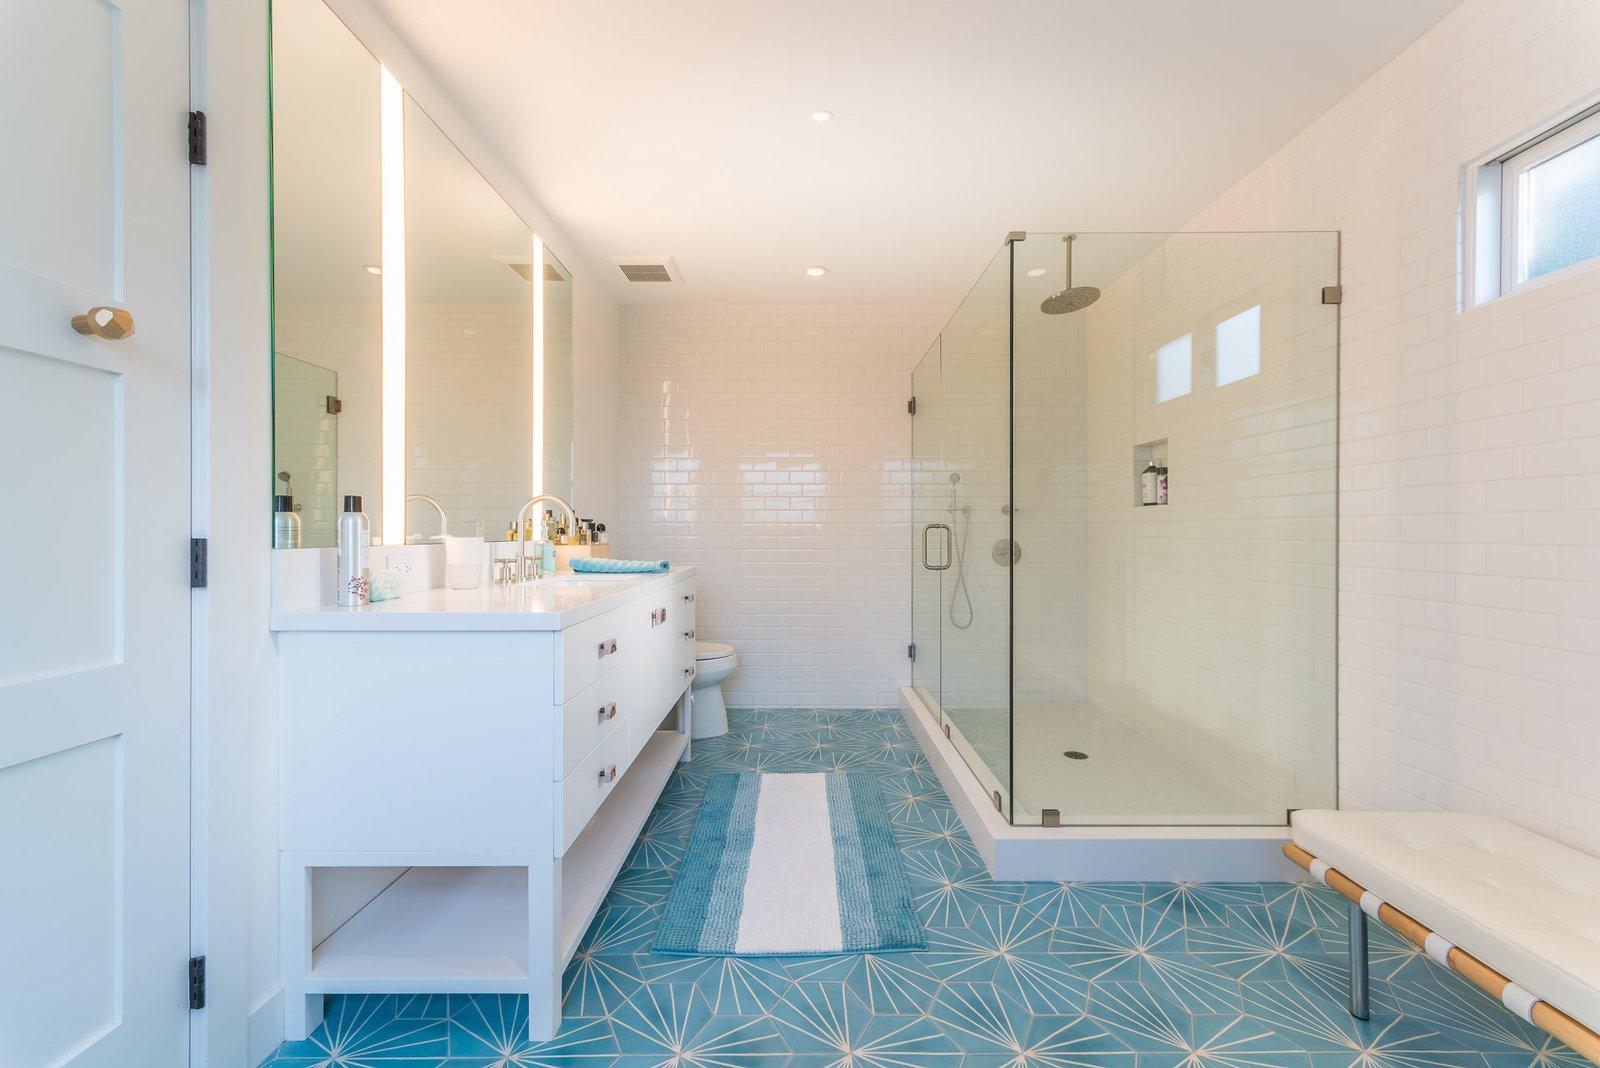 Bath Room, Enclosed Shower, and Corner Shower  Mid-Century Meets Boho Chic